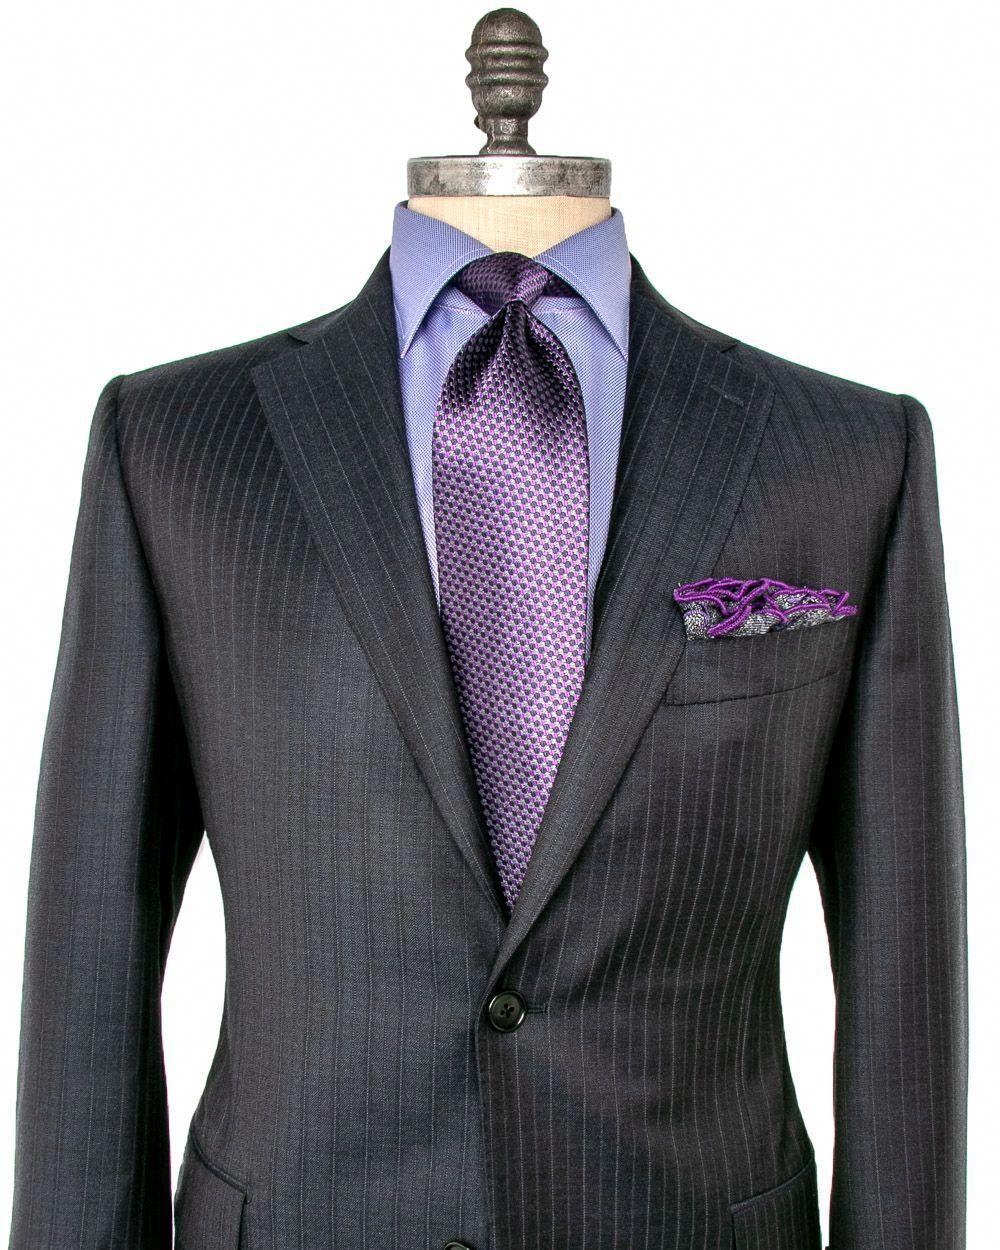 Black Pinstripe Suit Shirt Tie Combinations